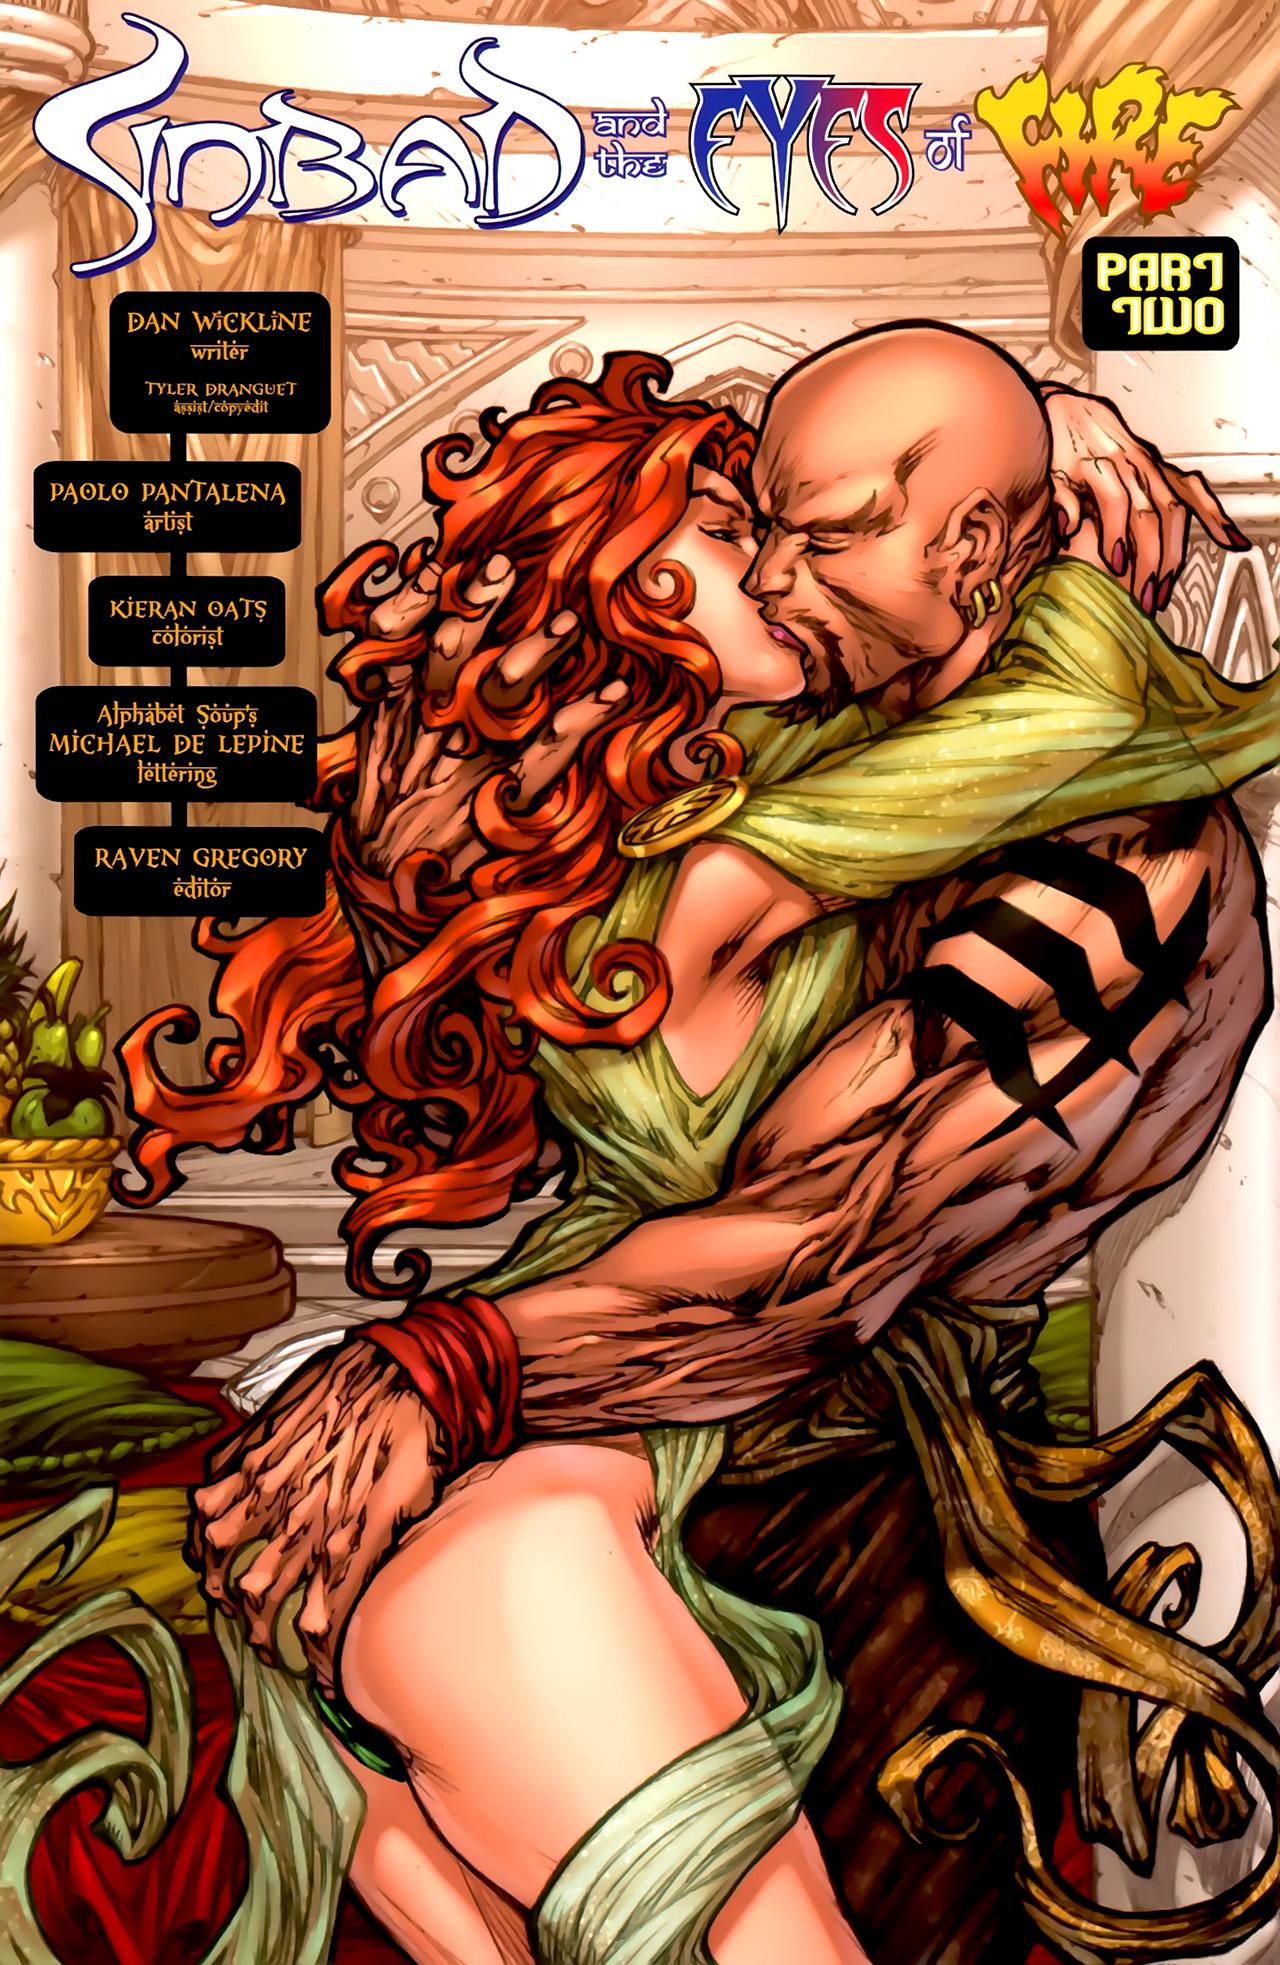 Read online 1001 Arabian Nights: The Adventures of Sinbad comic -  Issue #2 - 8